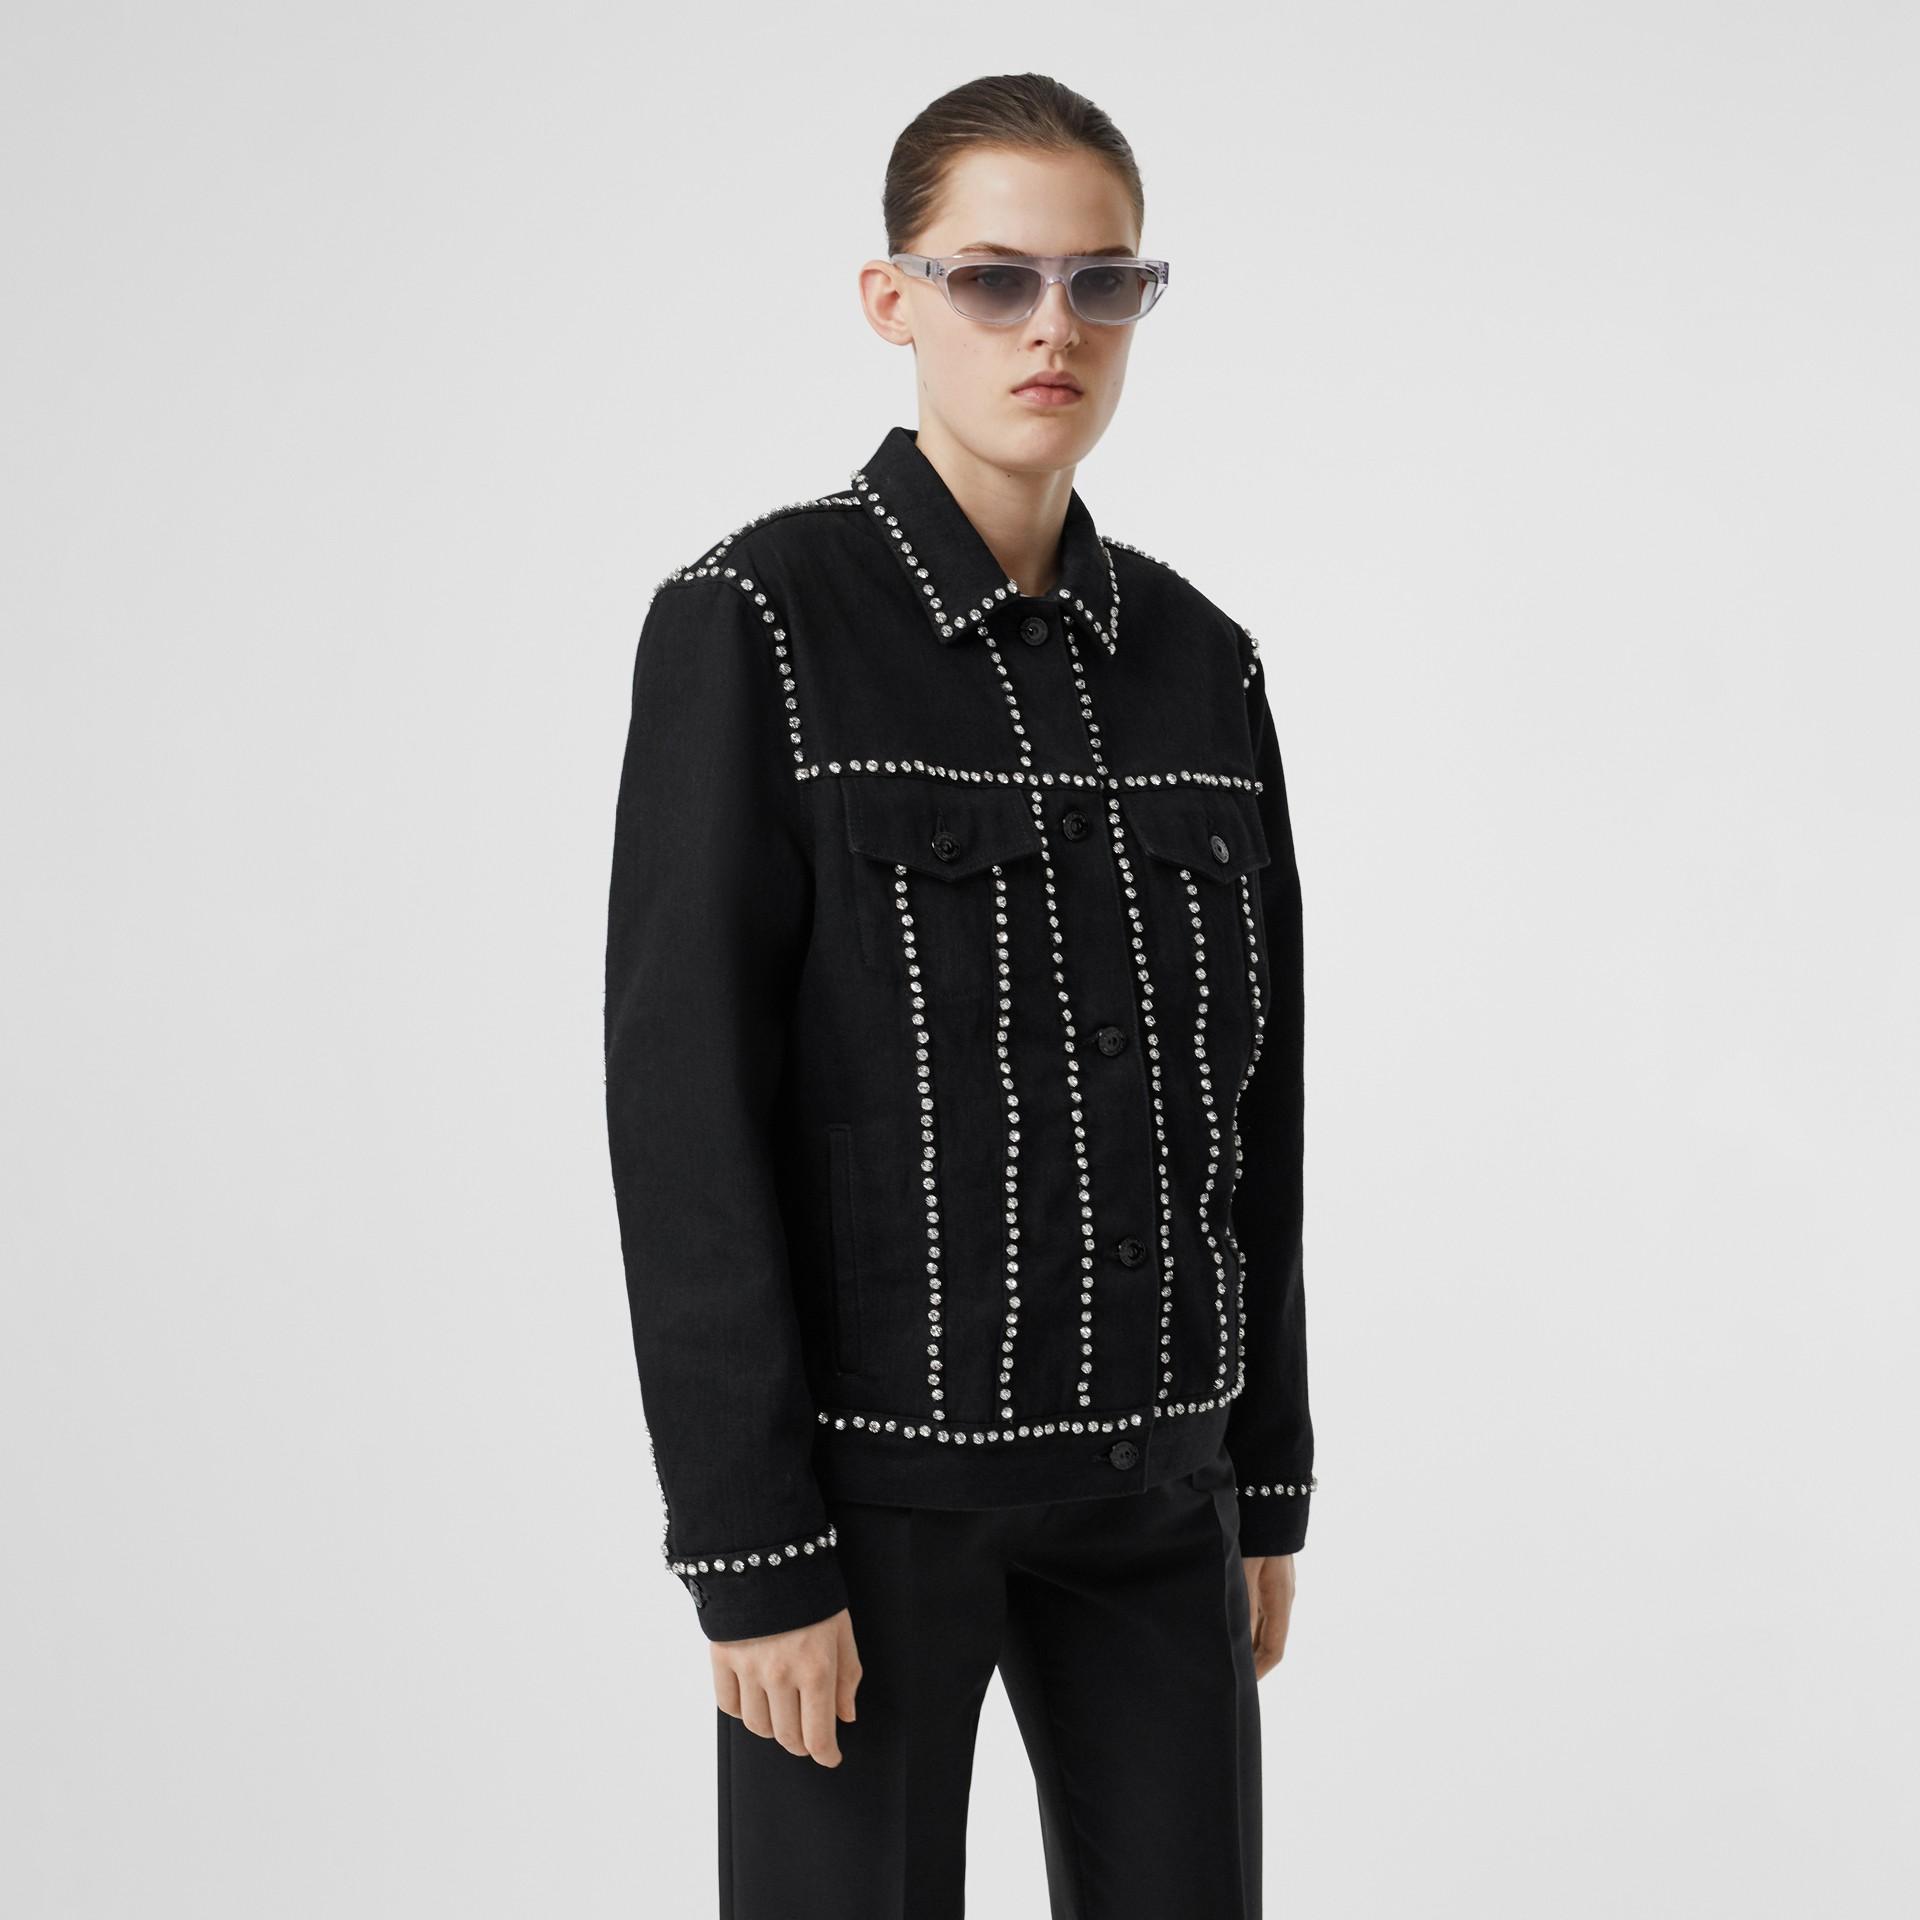 Crystal Logo Detail Japanese Denim Jacket in Black - Women | Burberry United Kingdom - gallery image 4